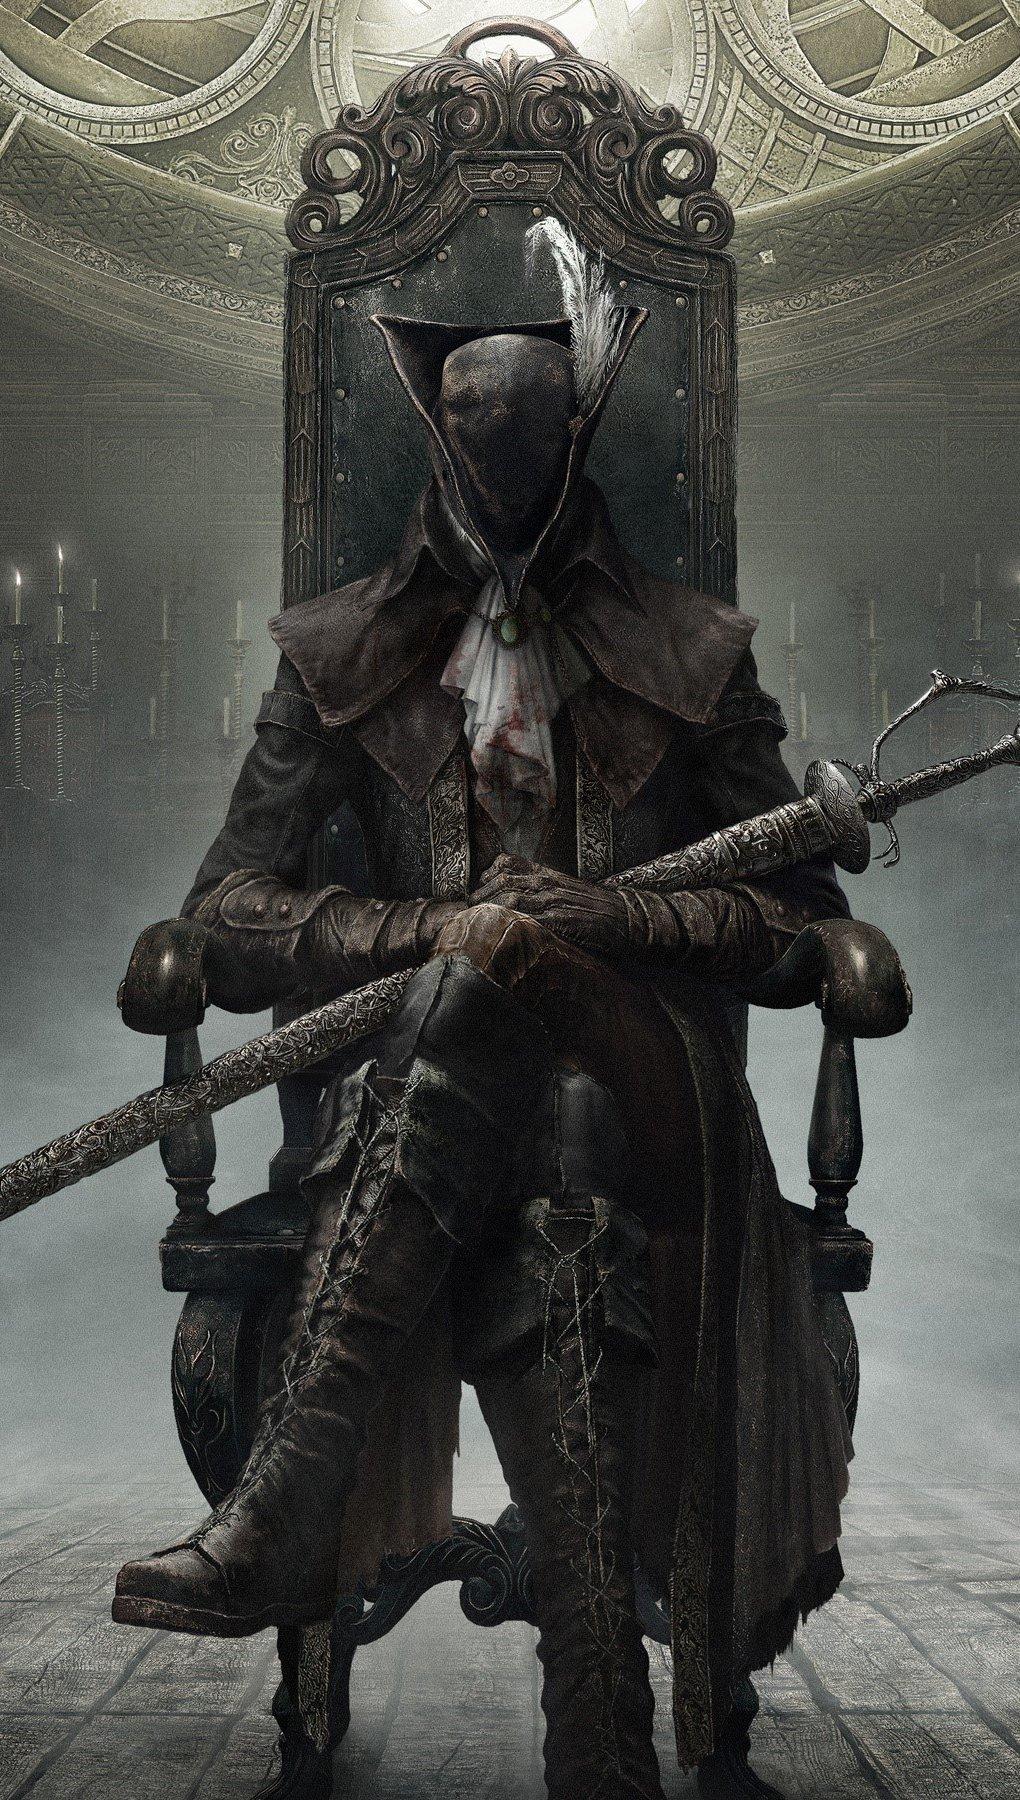 Fondos de pantalla Bloodborne en The old hunters Vertical